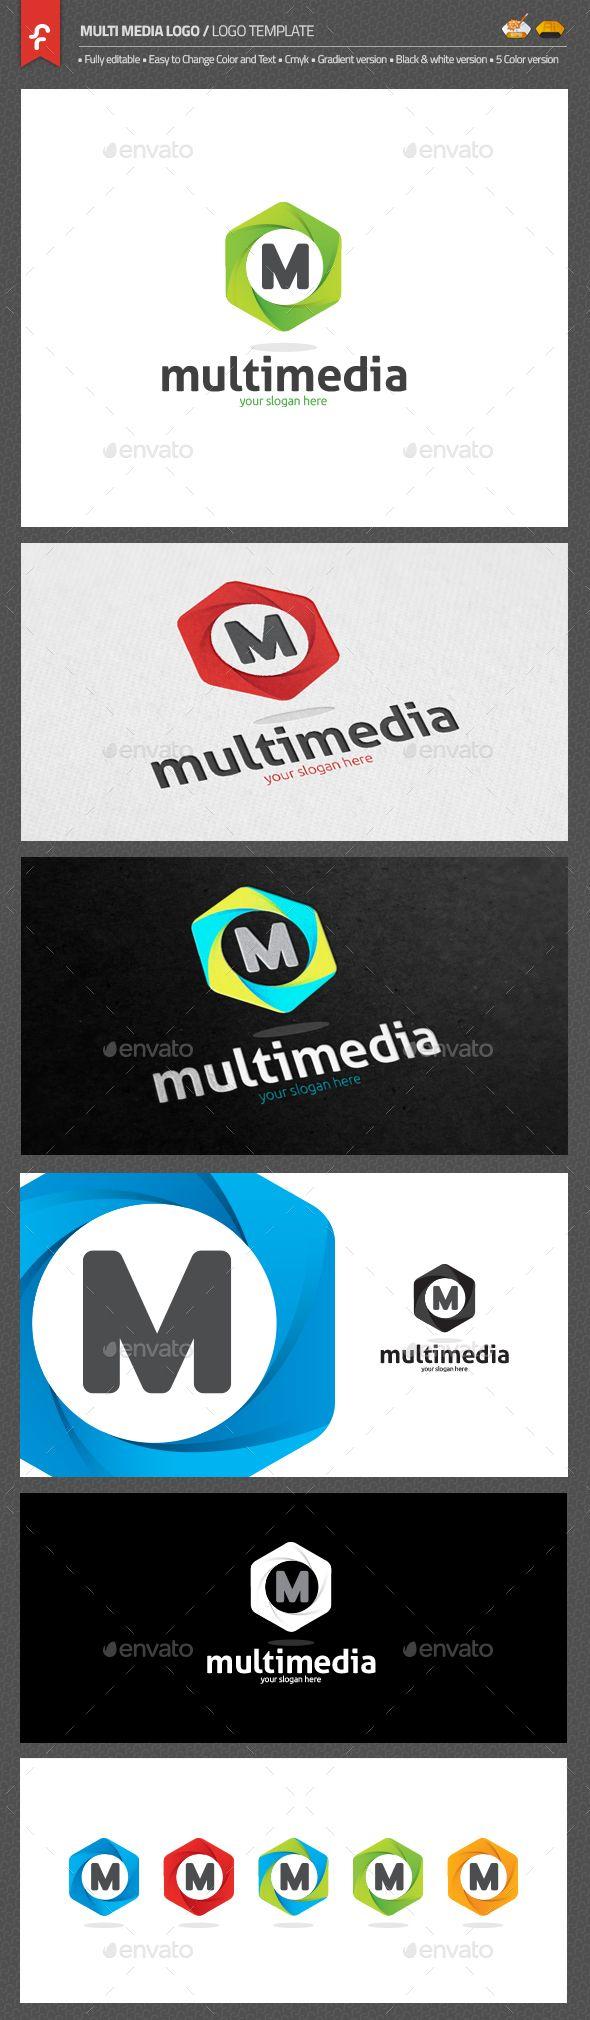 Multimedia Logo Template AI Illustrator. Download here: https://graphicriver.net/item/multimedia-logo/17626084?ref=ksioks